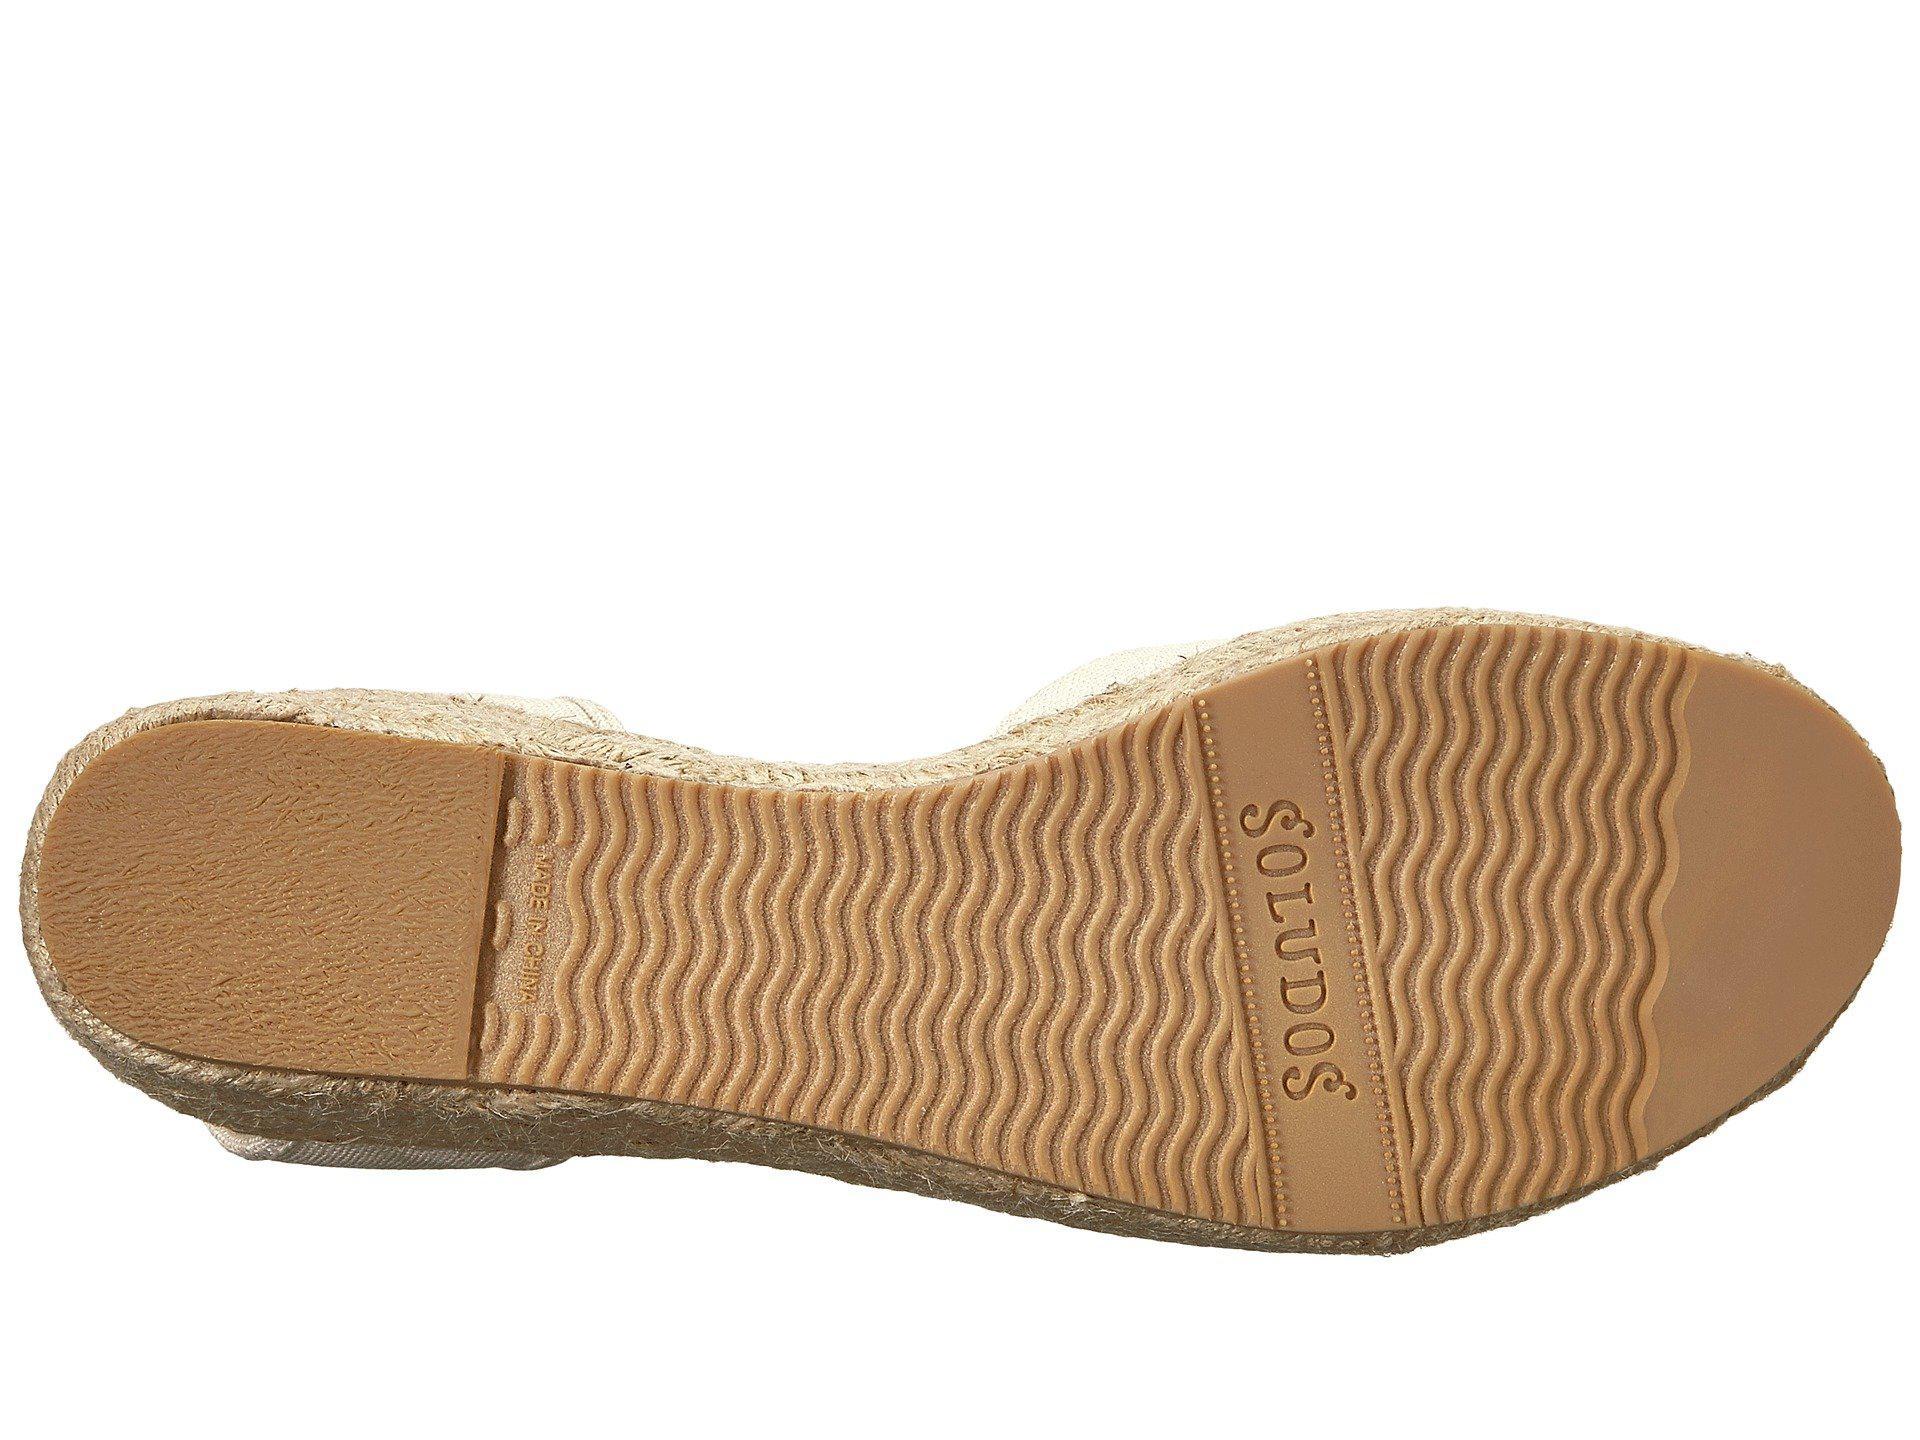 ad00a2d1617 Soludos - Multicolor Open-toe Platform 60mm (blush) High Heels - Lyst. View  fullscreen